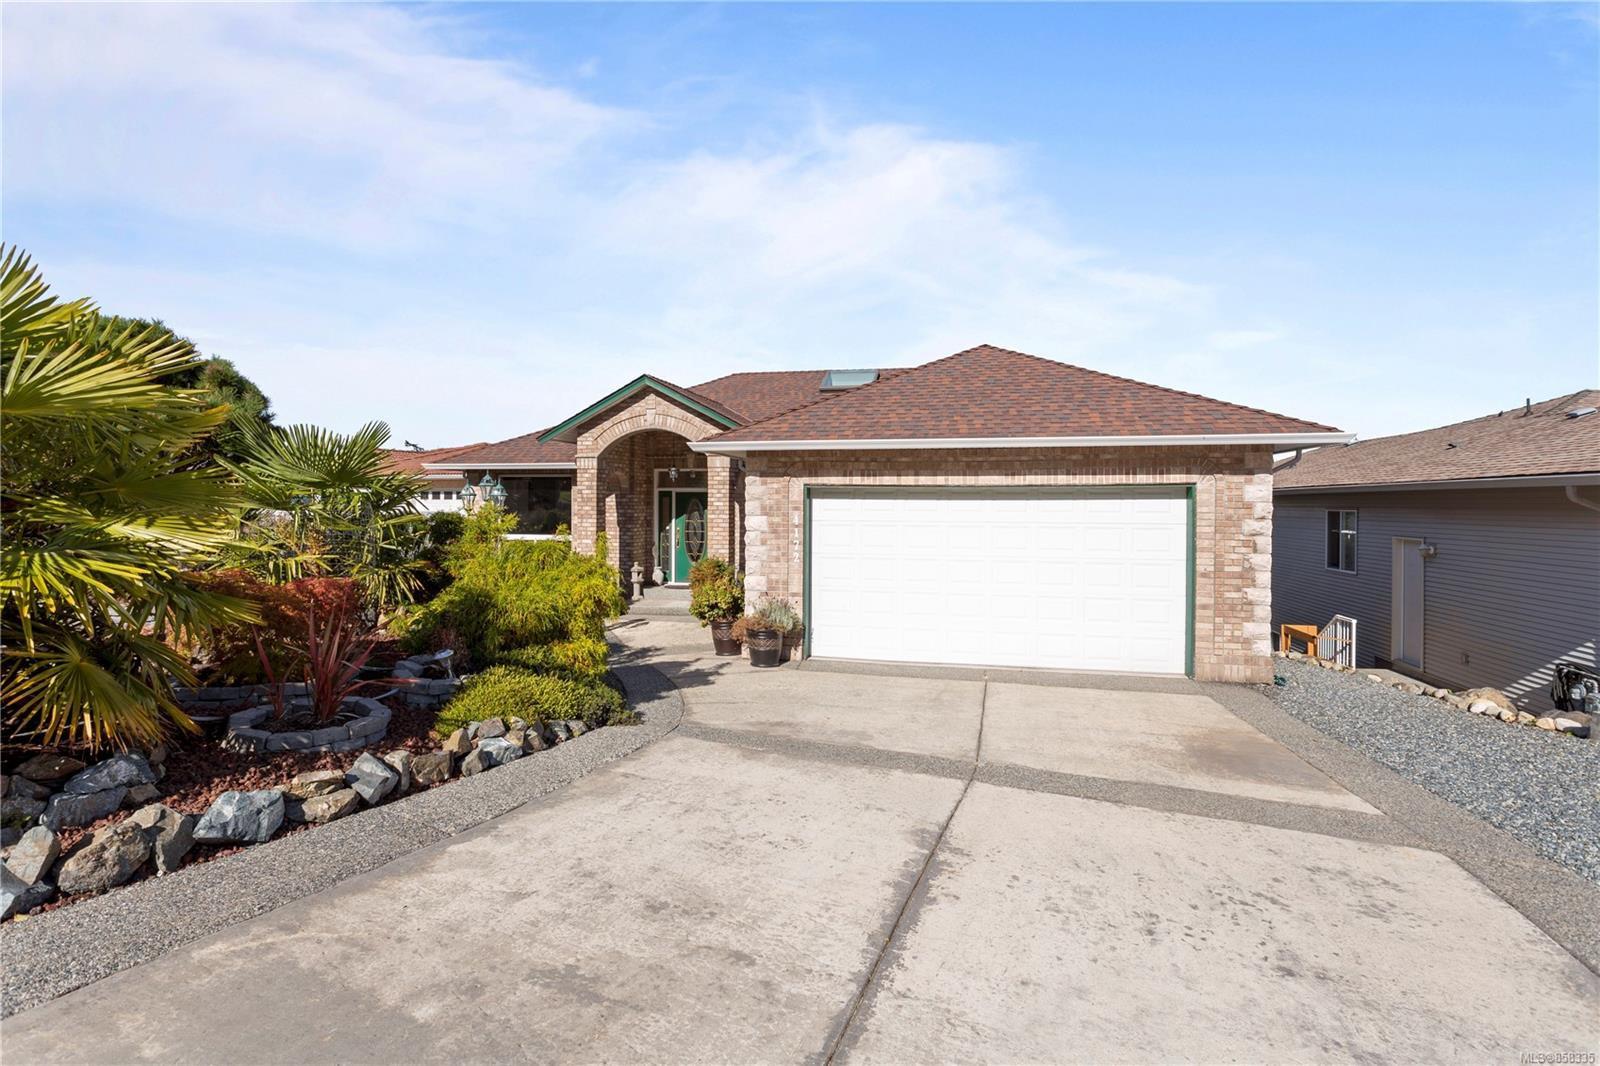 Main Photo: 4172 Gulfview Dr in : Na North Nanaimo House for sale (Nanaimo)  : MLS®# 858335